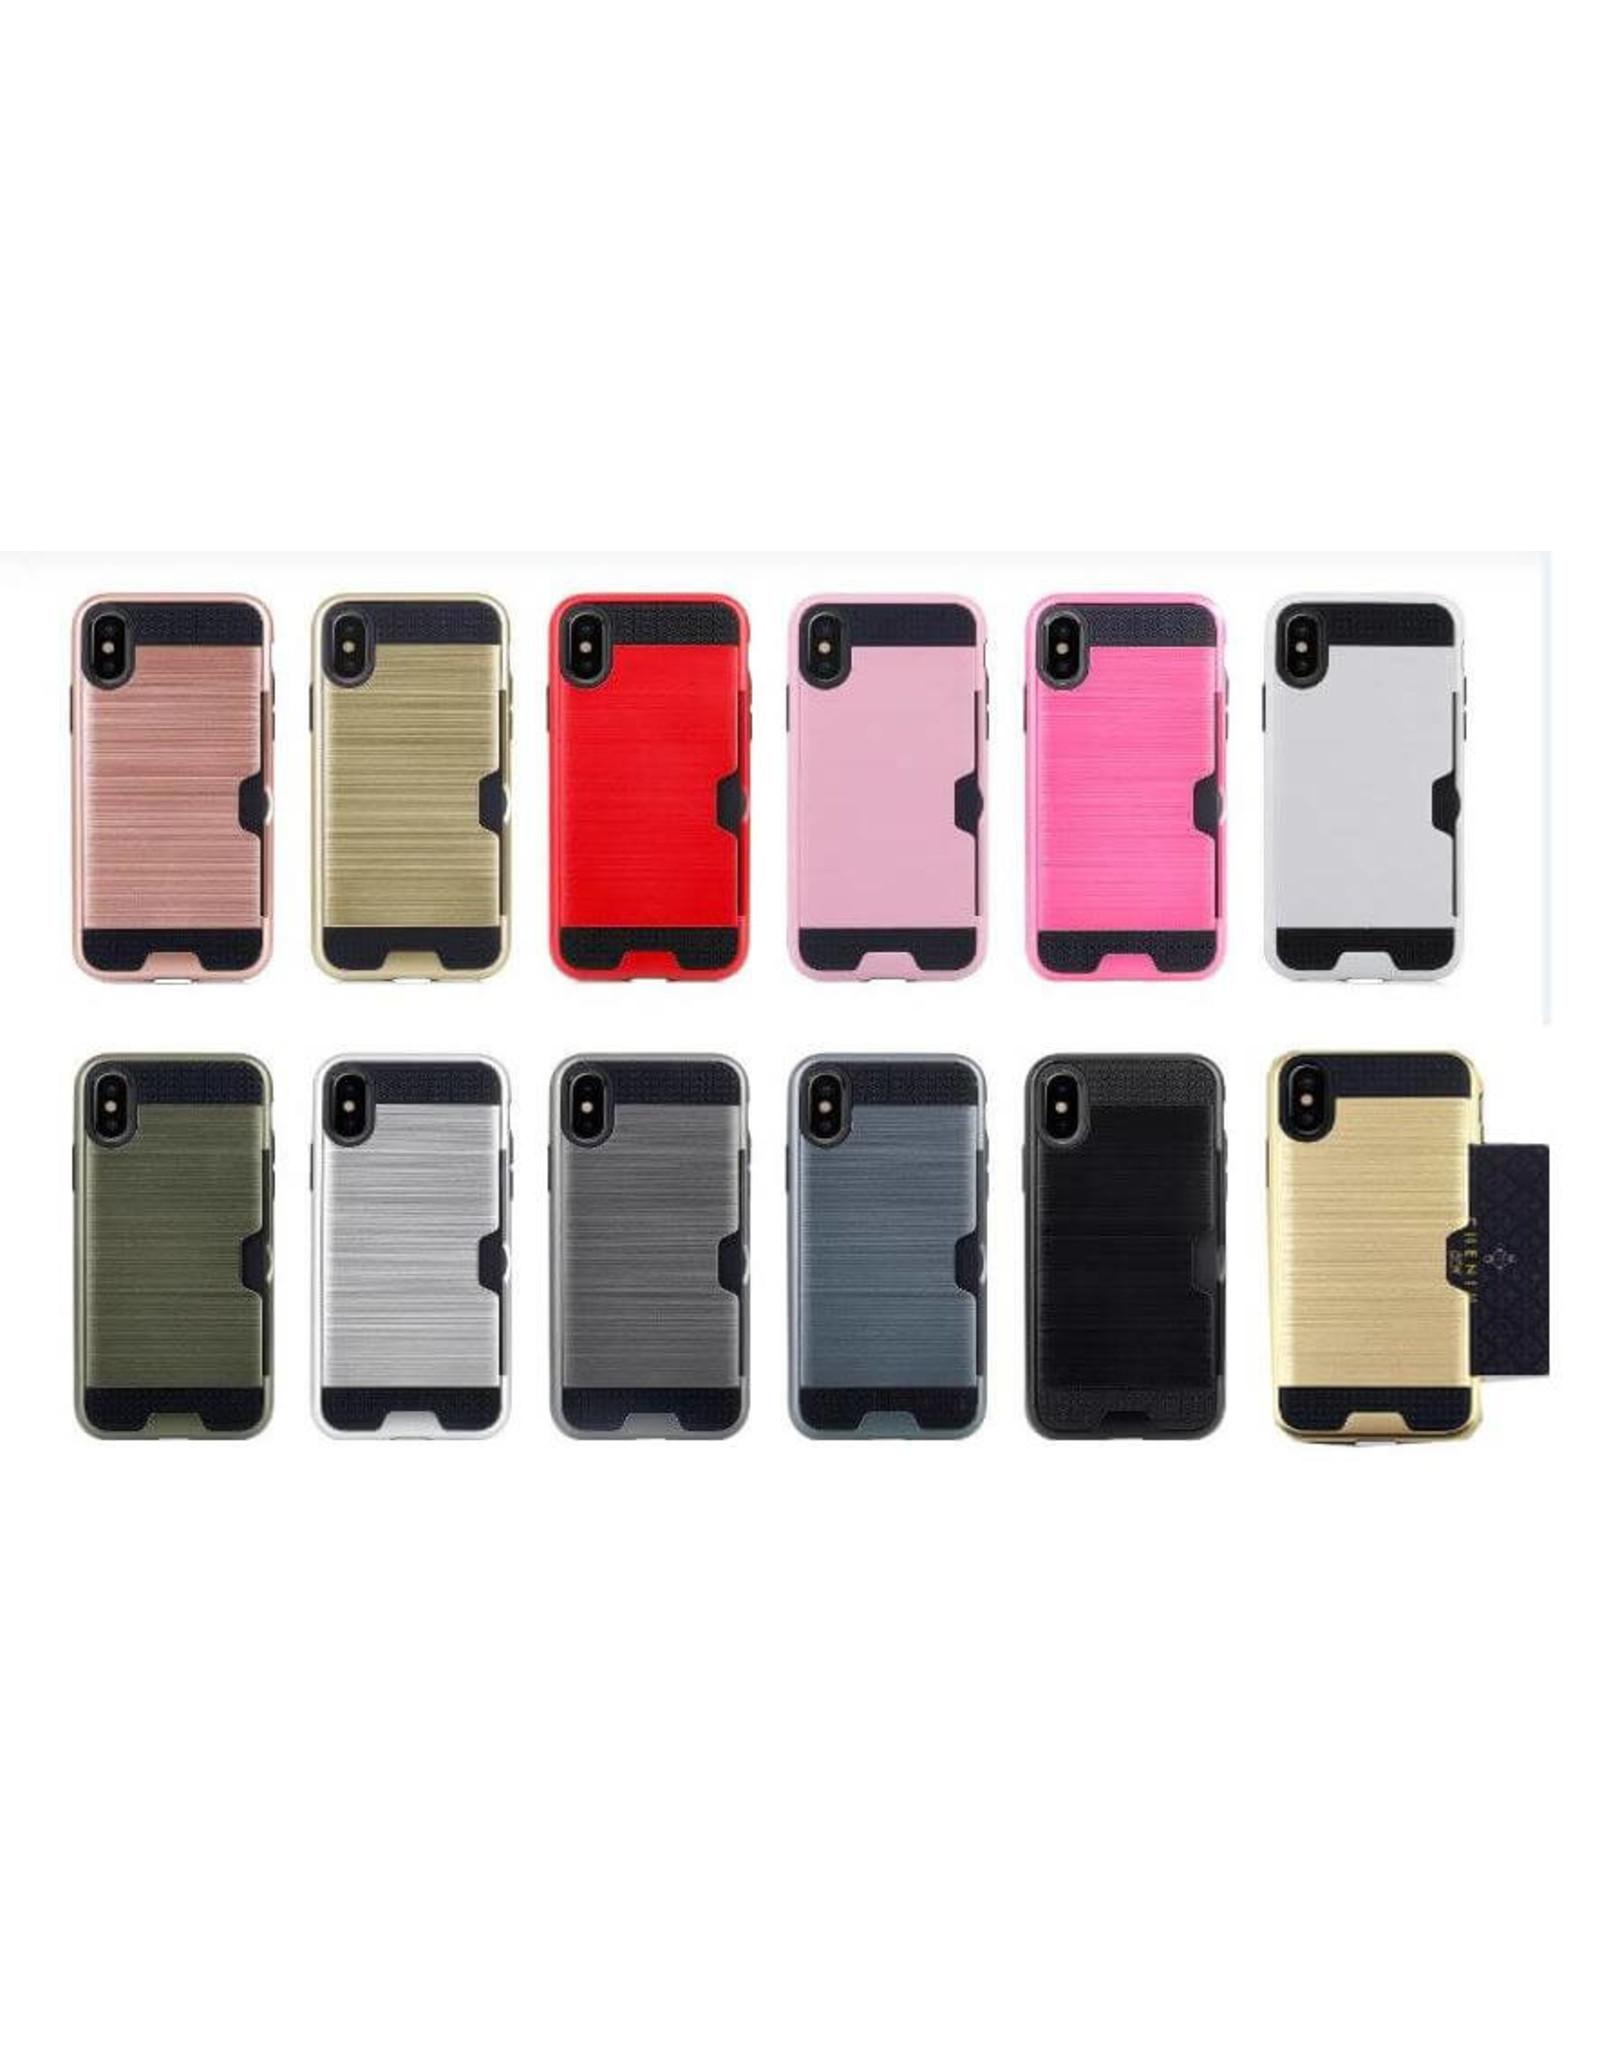 iPhone 7 Plus / 8 Plus hardcase, schokbestendig hoesje met bankpas vakje